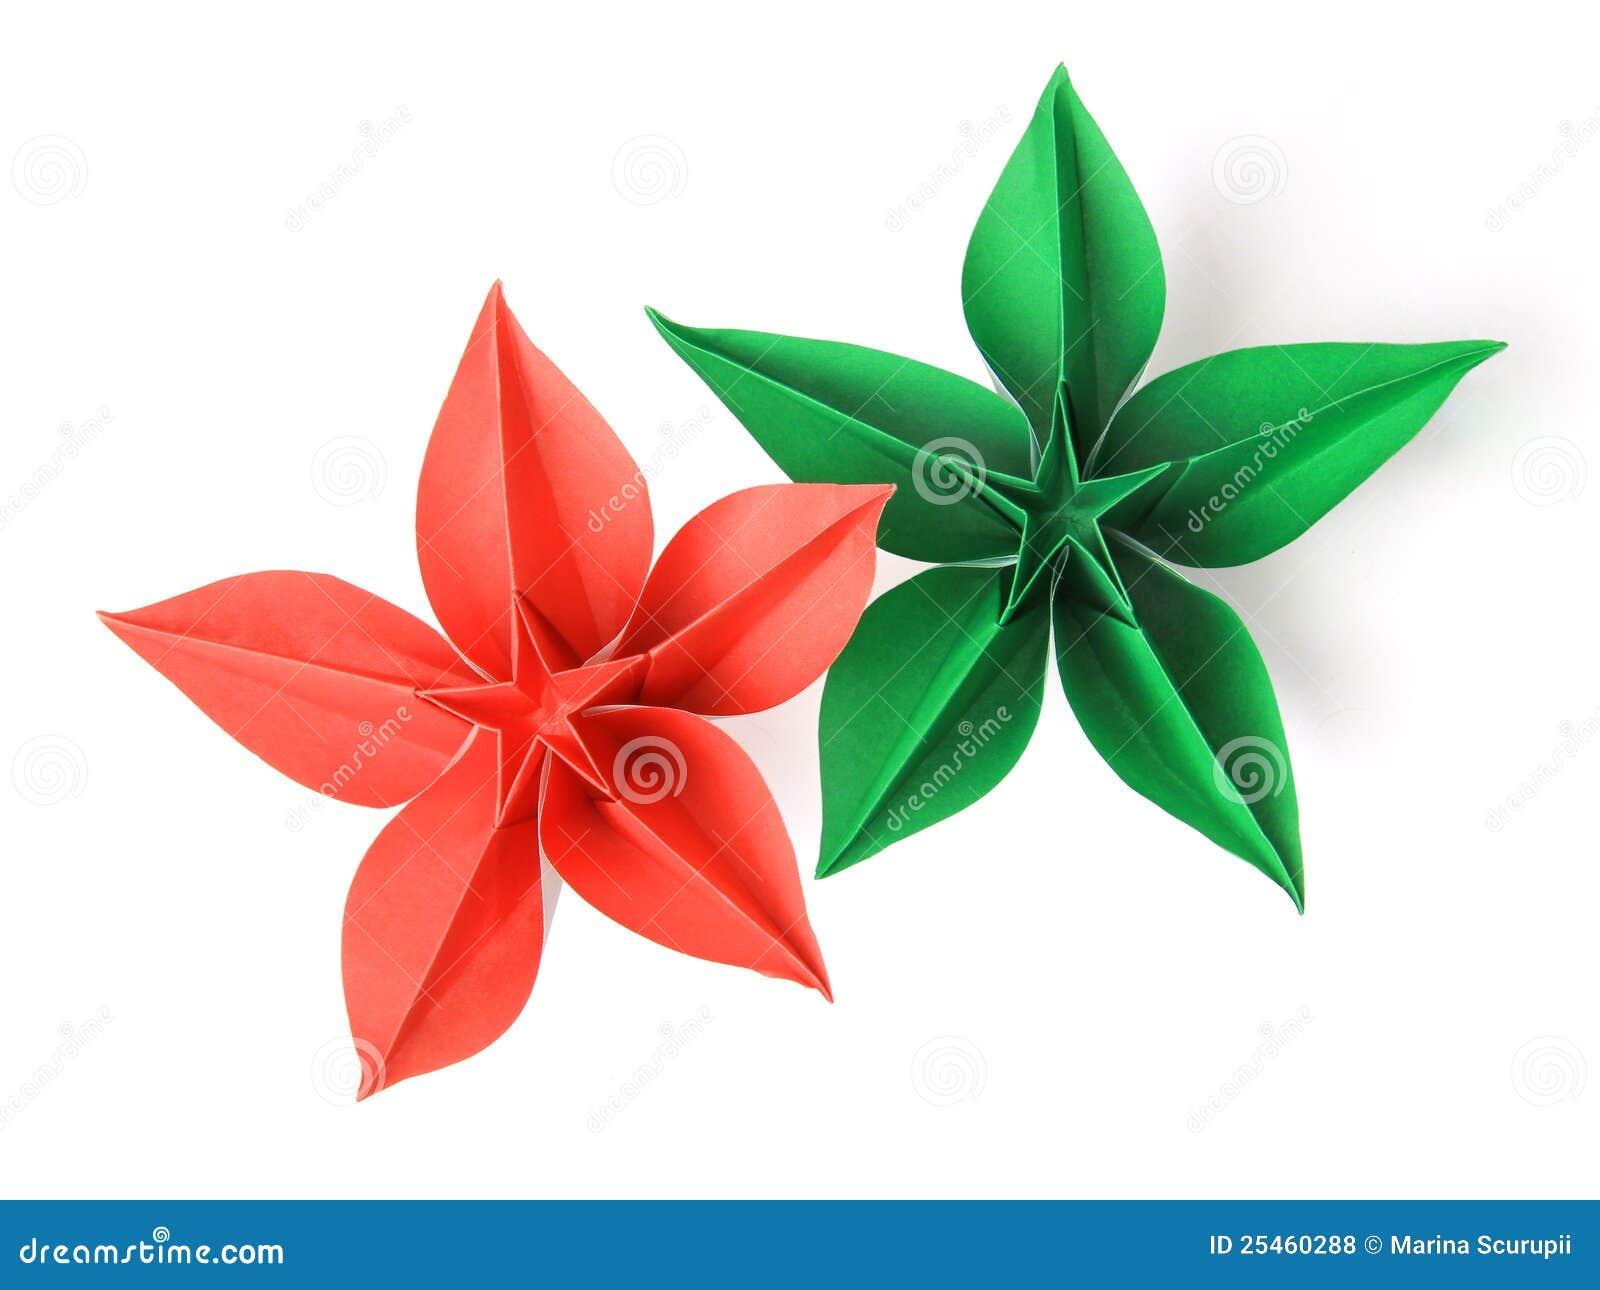 Flower Origami Stock Photo Image Of Leaf Creativity 25460288